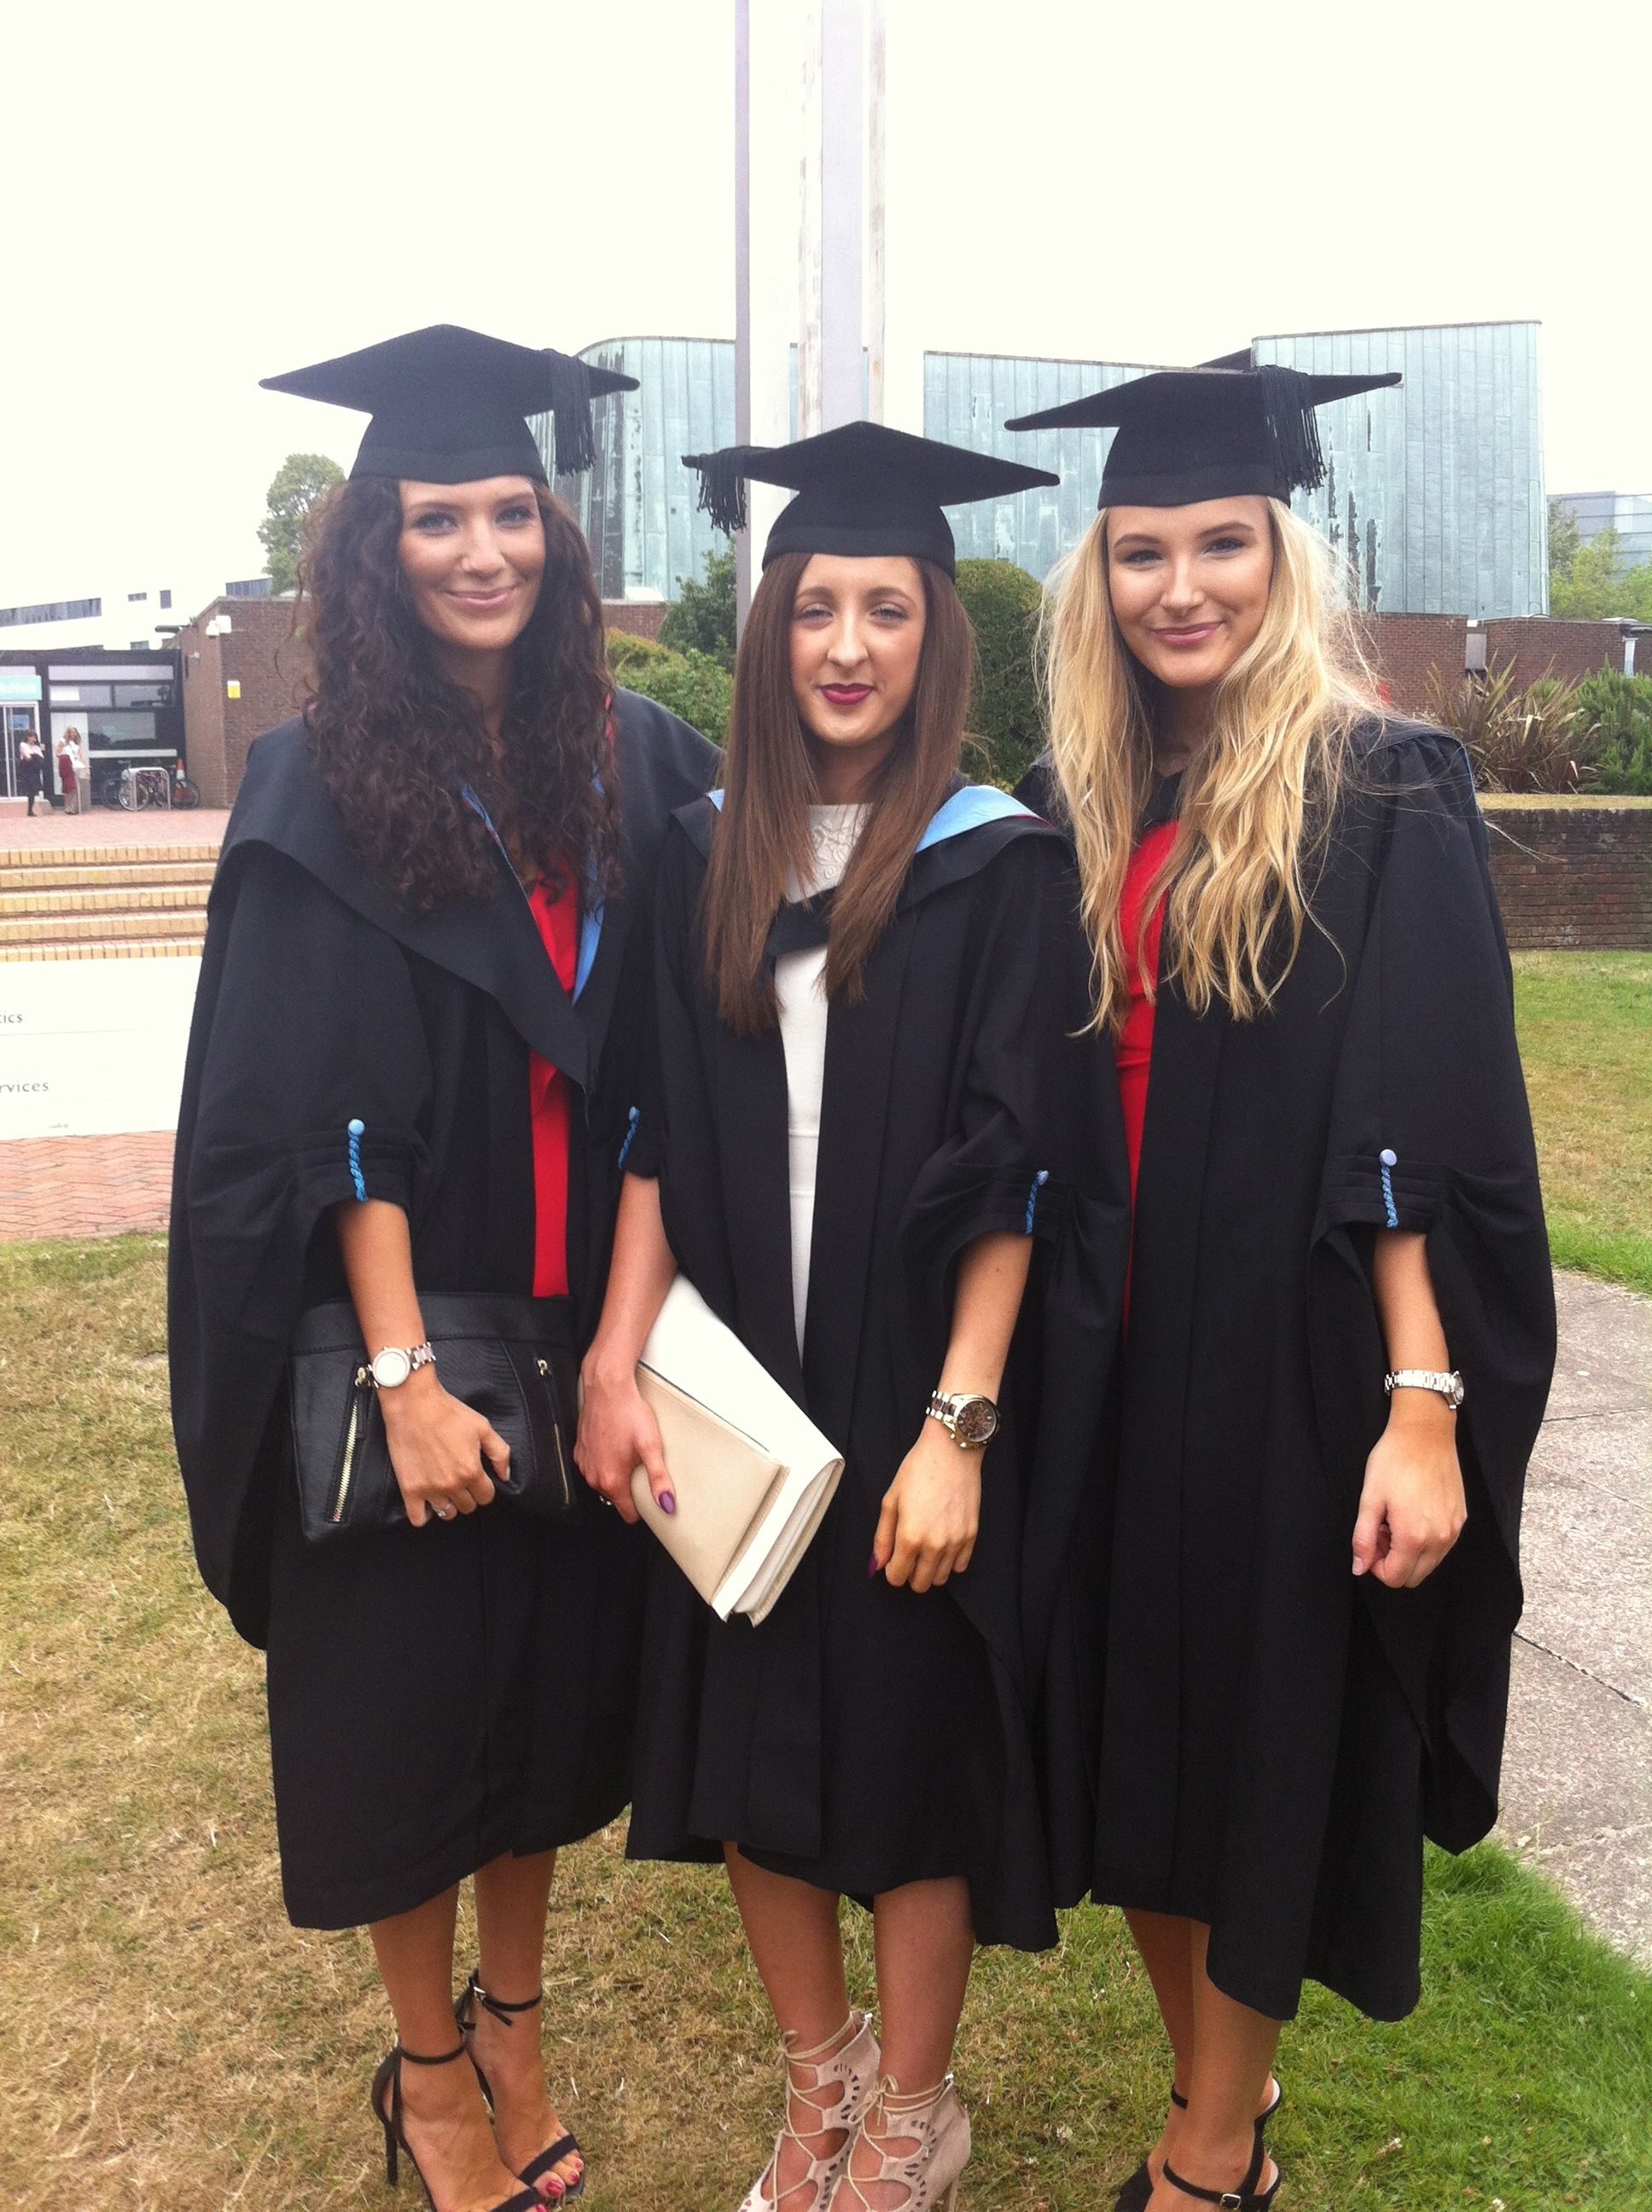 Wsa Fashion Marketing Graduates 2015 Marketing Of Fashion